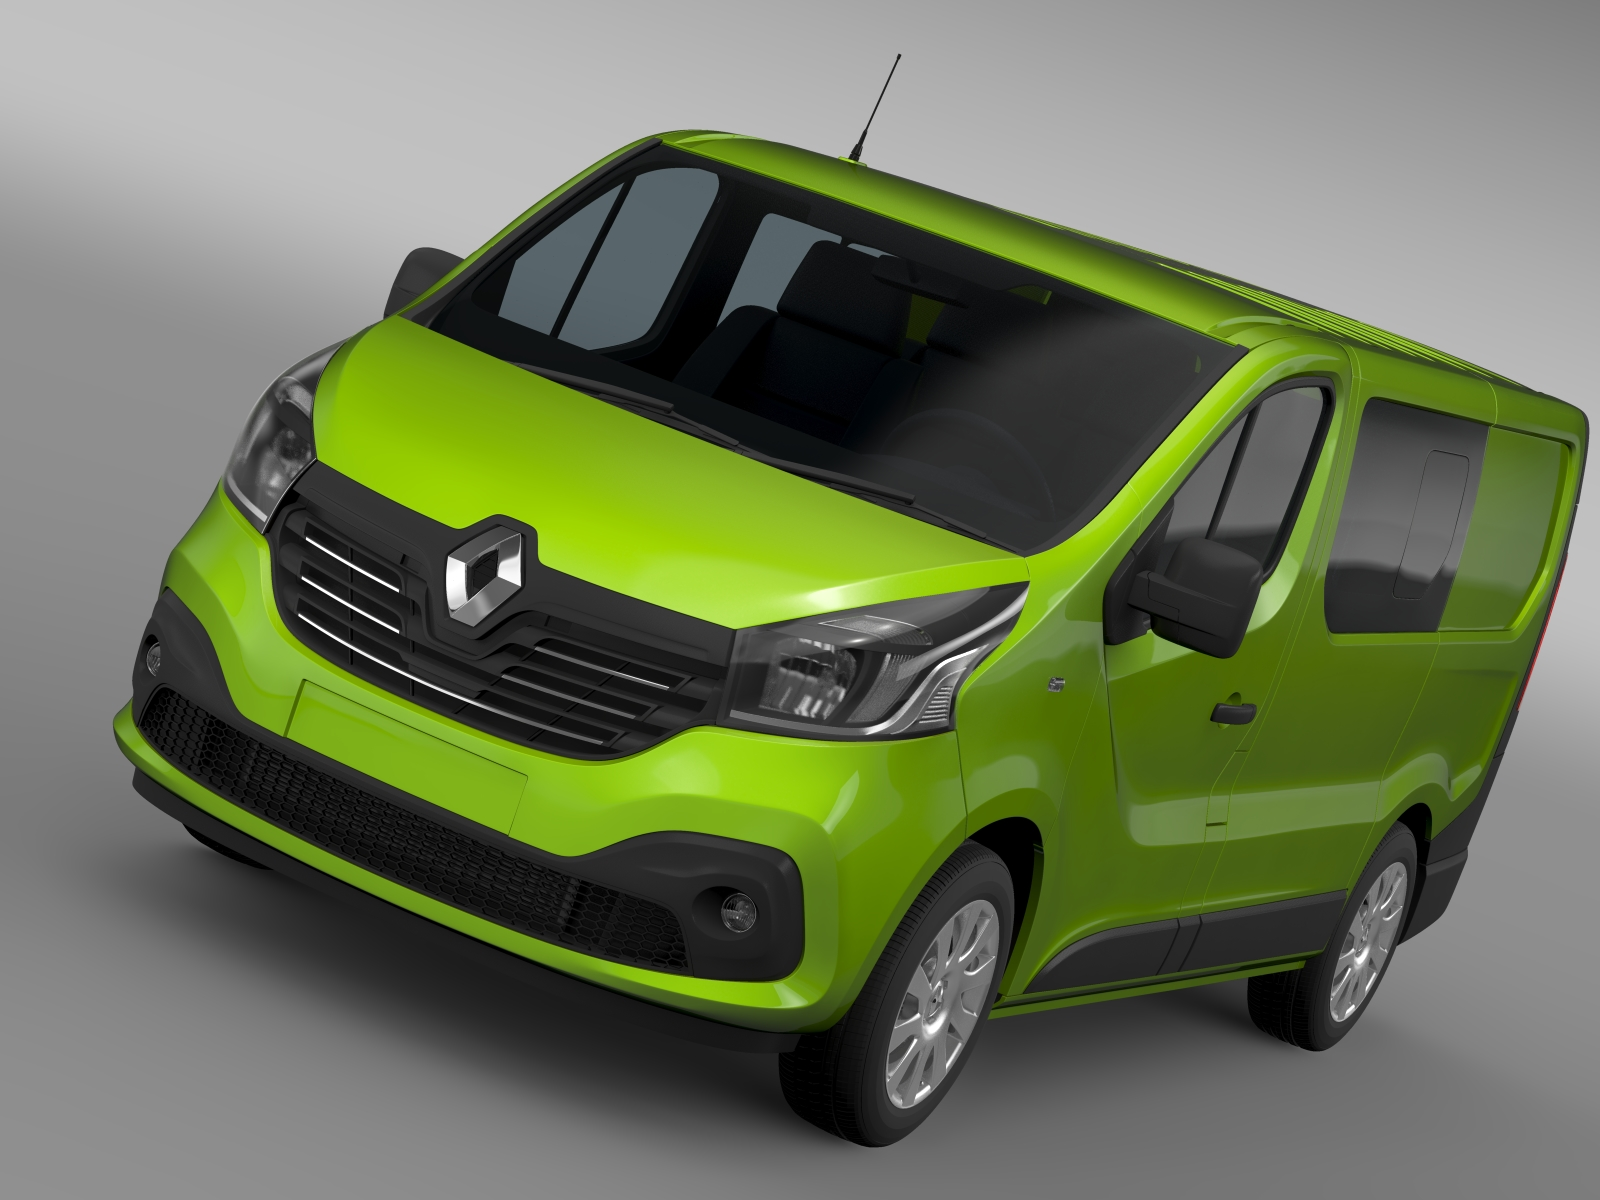 renault trafic combi 2015 3d modelis 3ds maks.